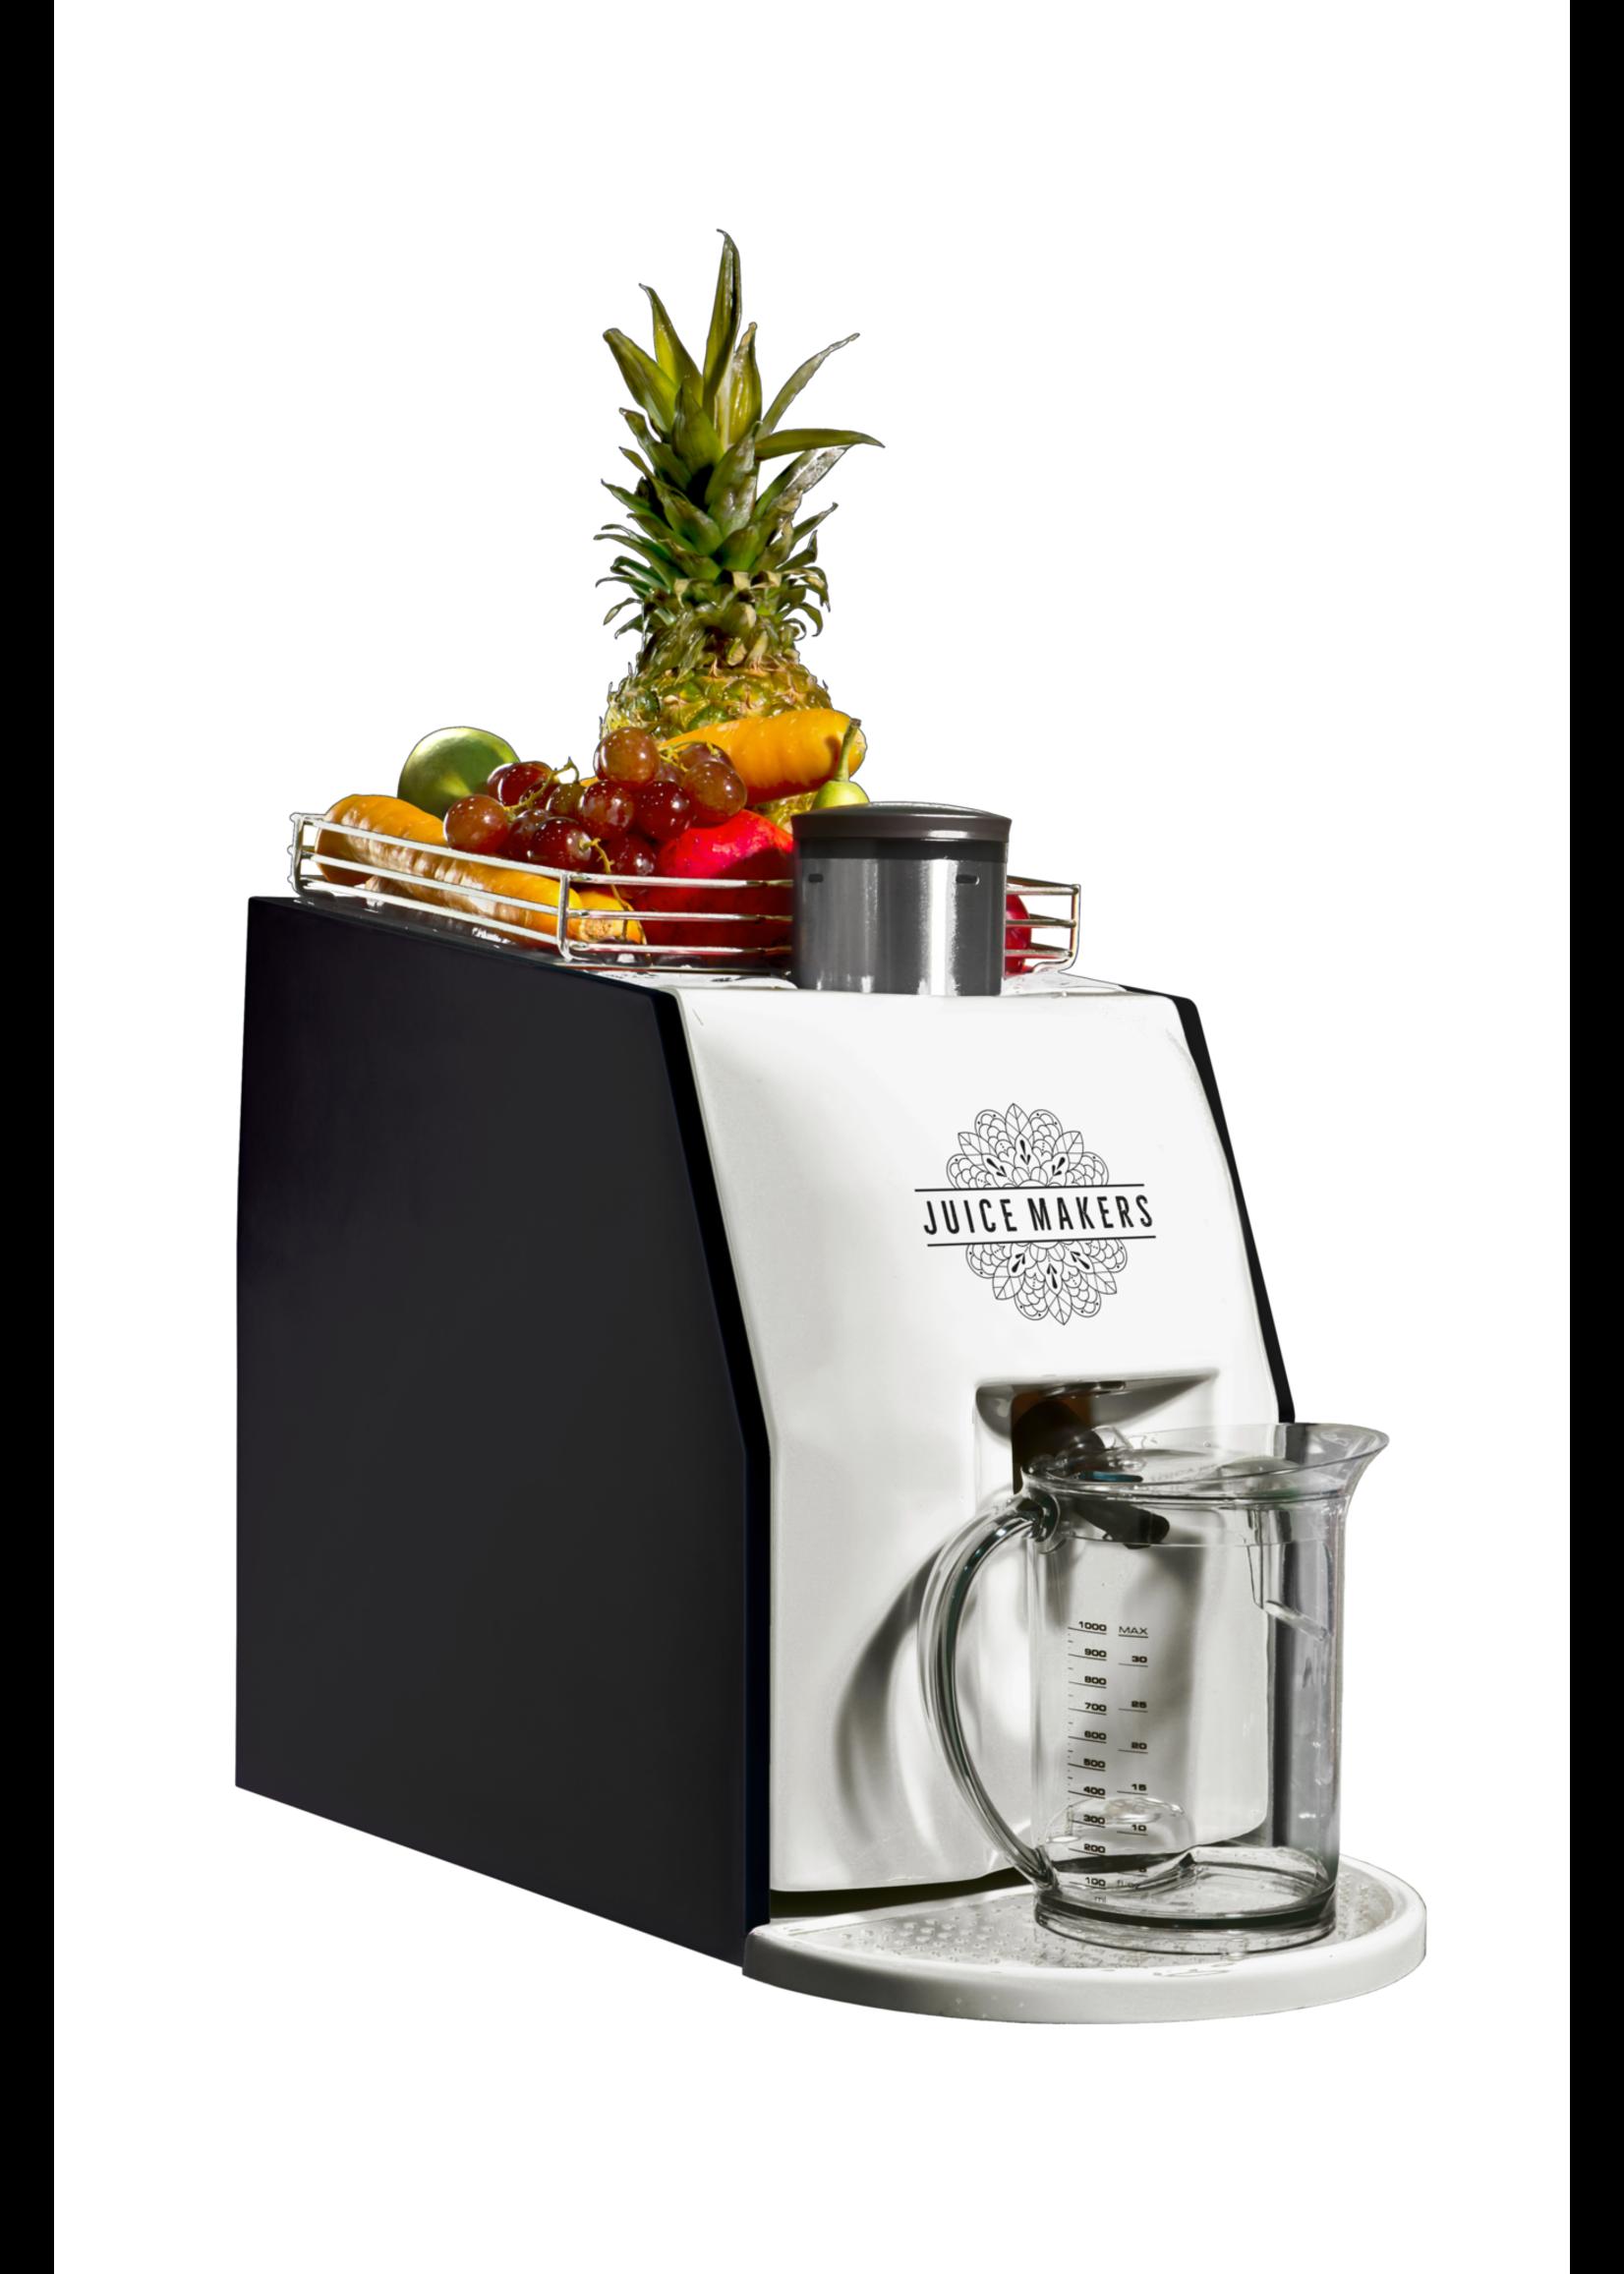 JuiceMakers Pro Sapapparaat  met waterrreservoir